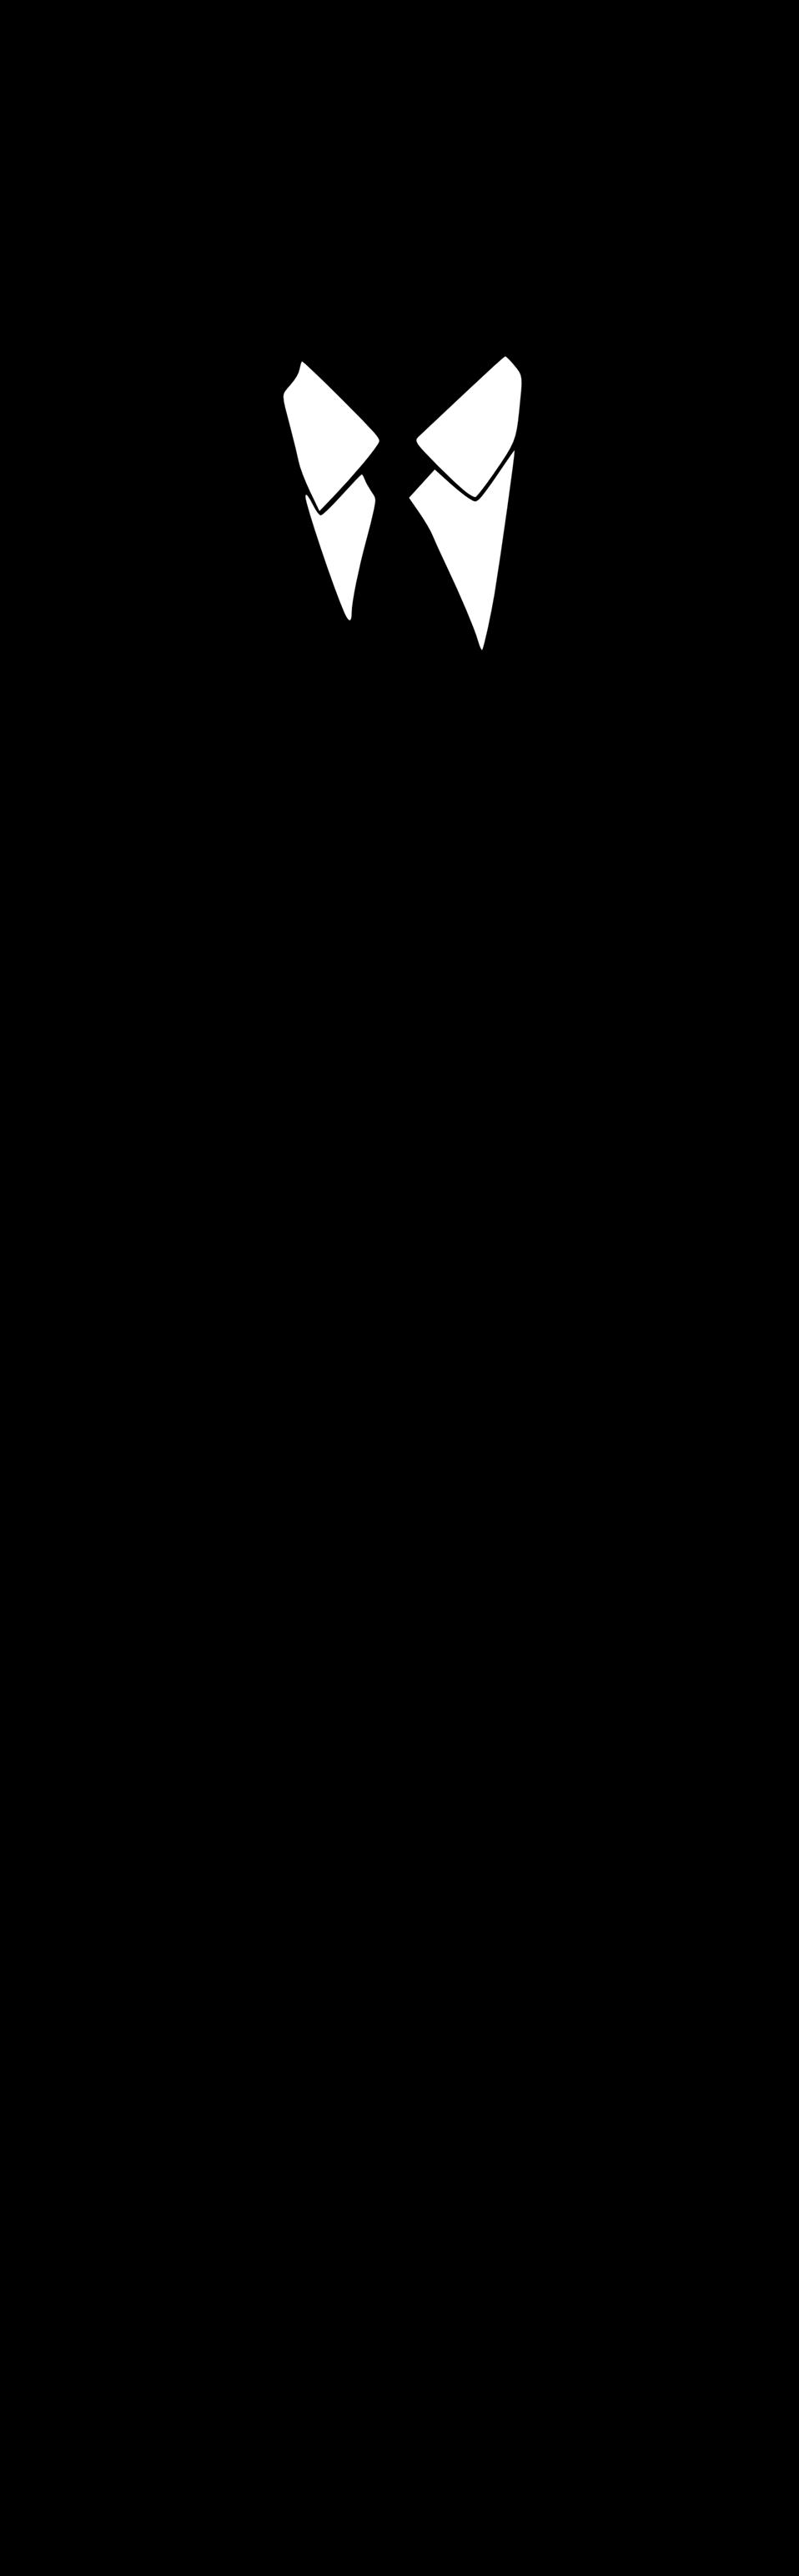 958x3089 Man Clipart Tuxedo